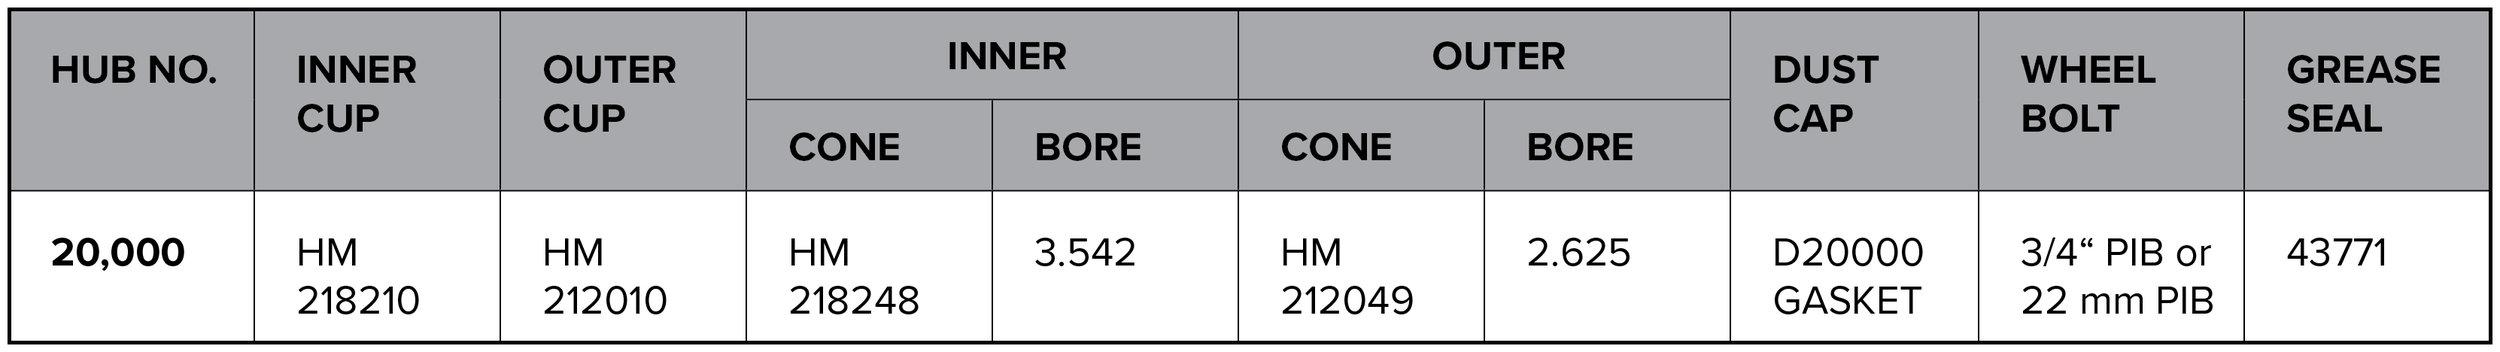 20000_Series_Hub-&-Component-Parts.jpg